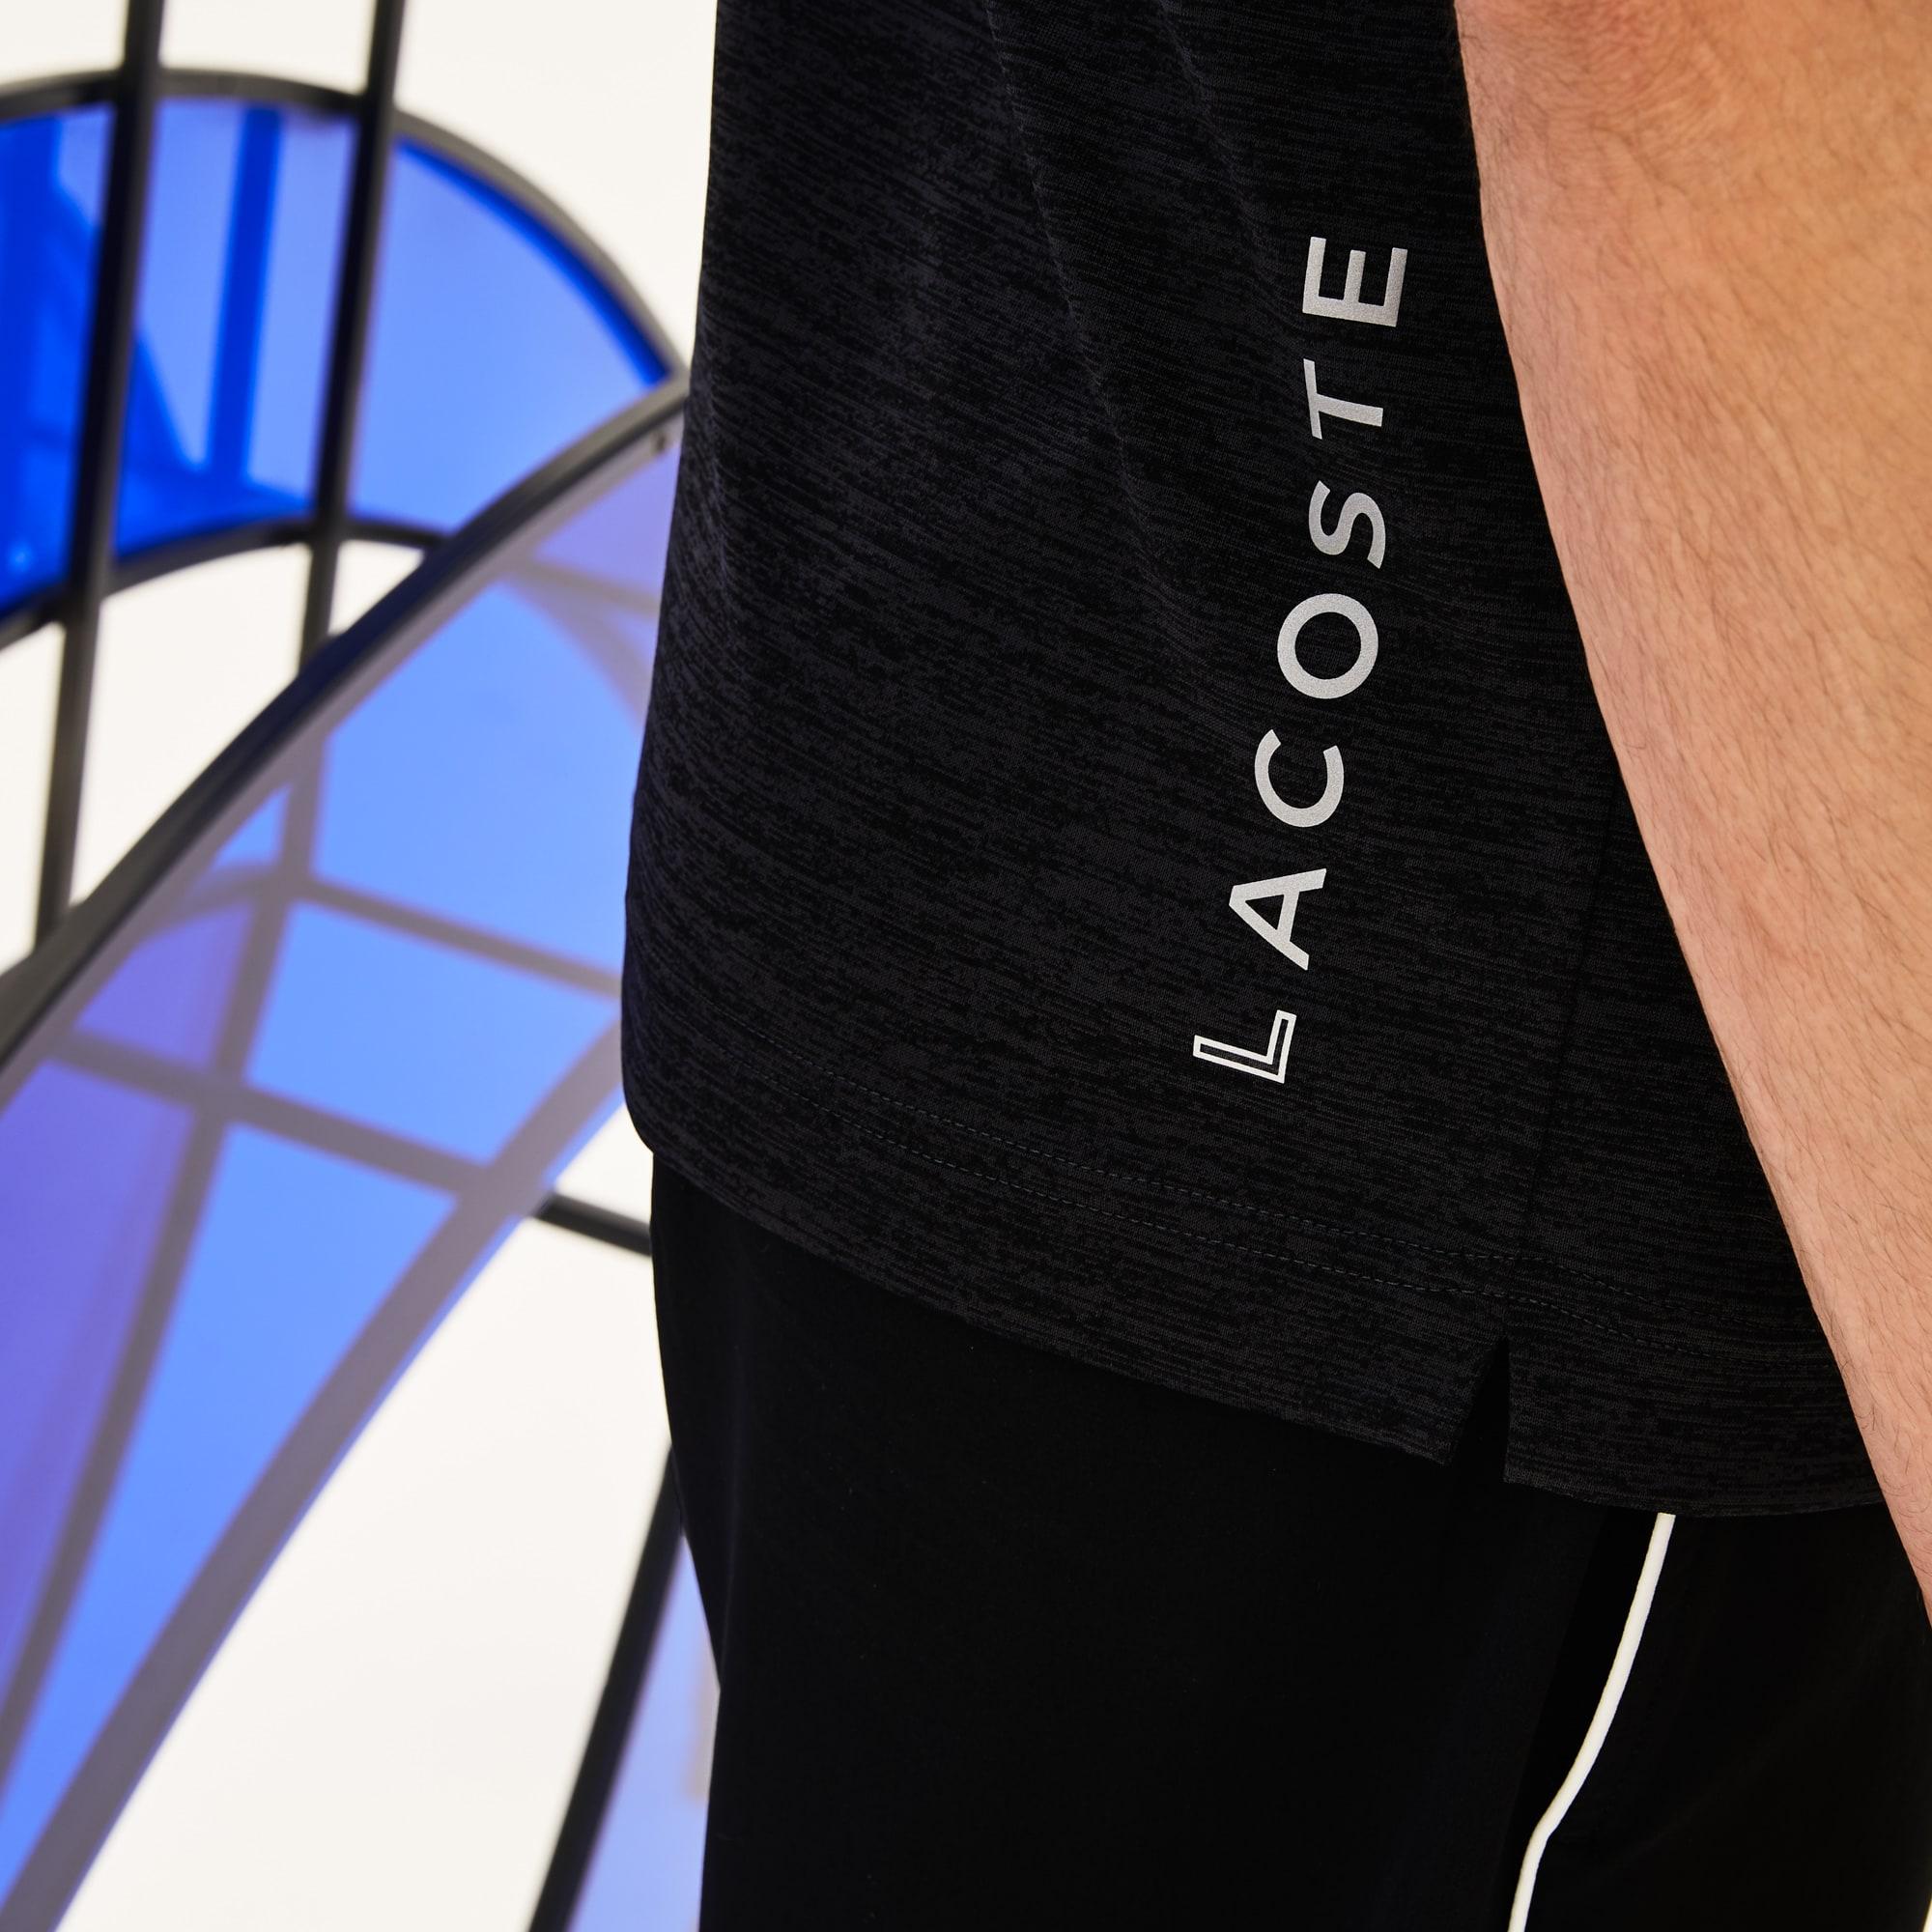 Lacoste - Herren-Poloshirt aus meliertem Jersey LACOSTE SPORT - 8